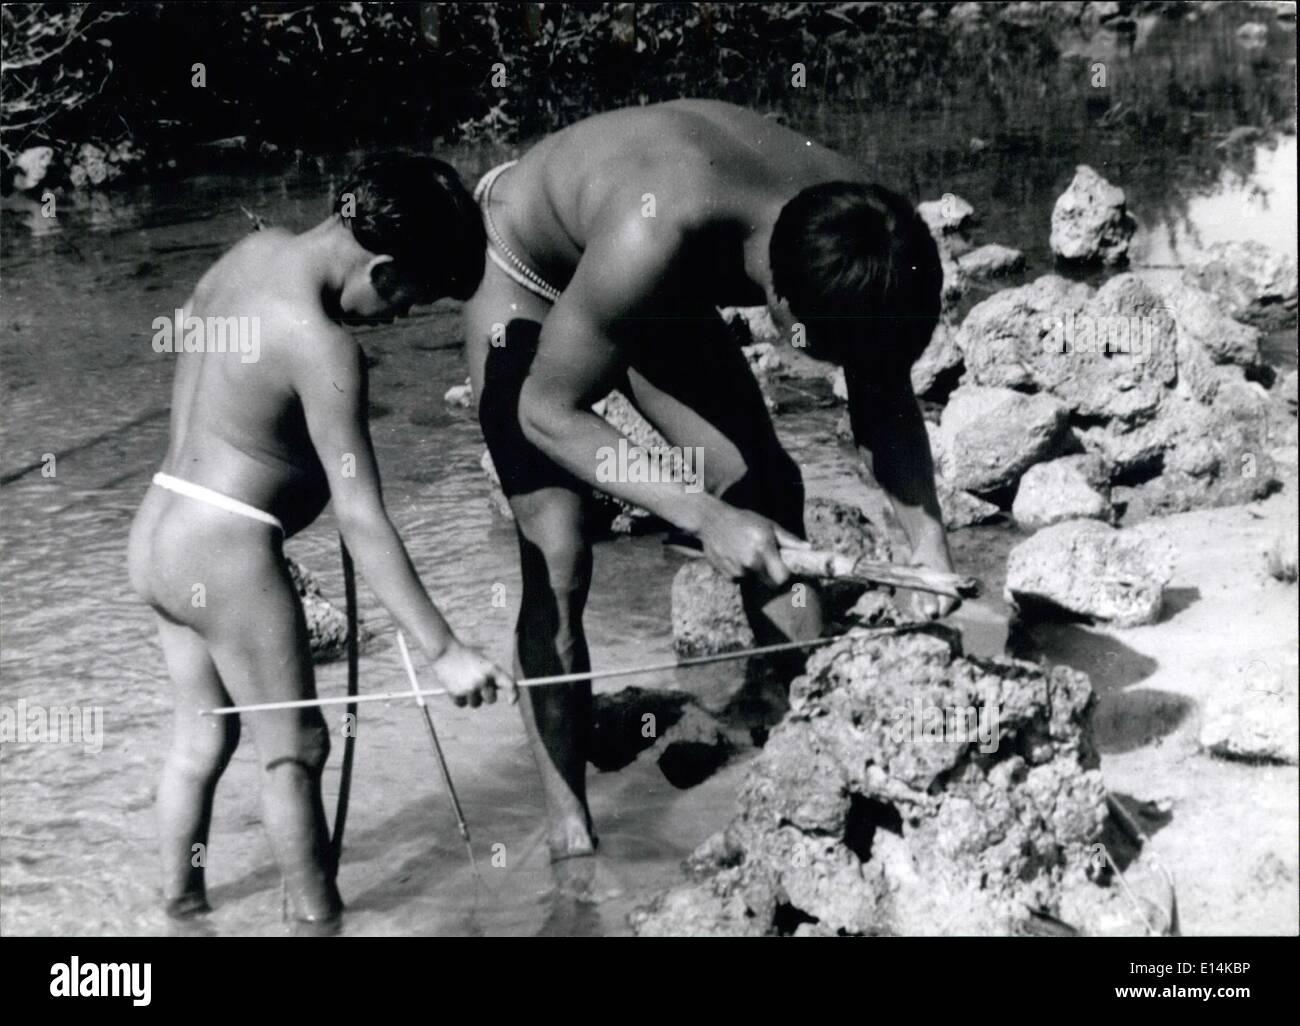 Apr. 18, 2012 - Brazil: Primitive Indians of the Amazon Kamayura tribe - Stock Image